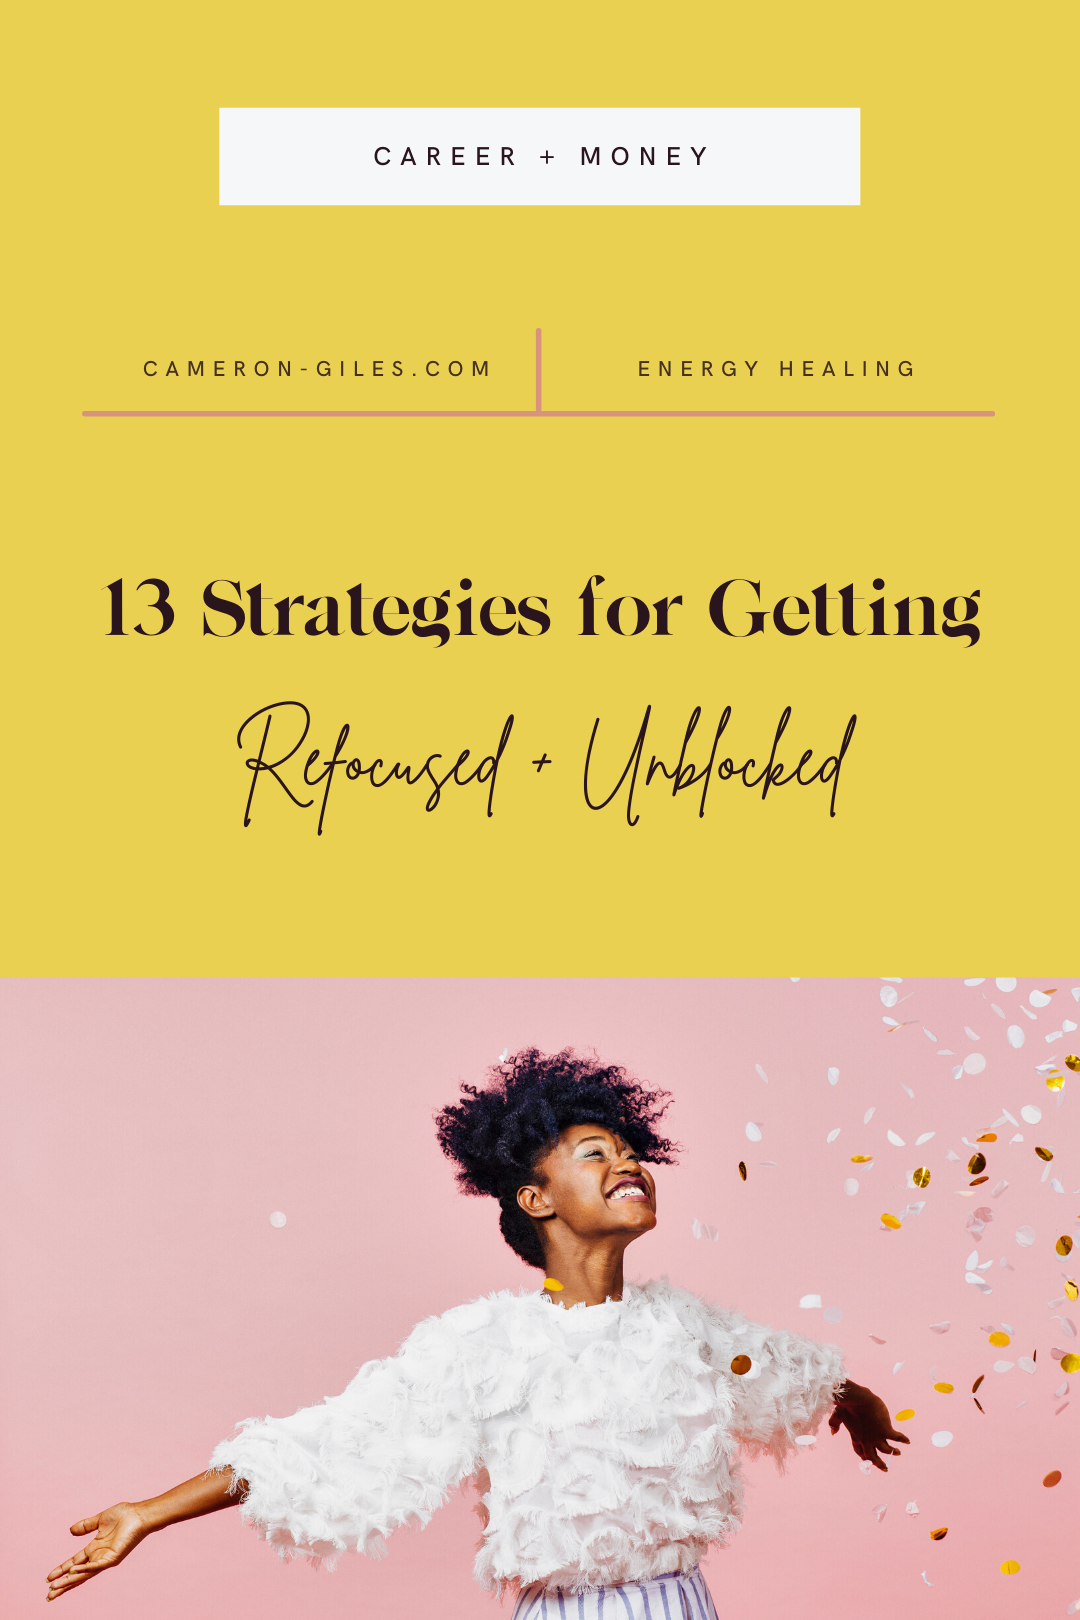 13 Strategies For Getting Refocused + Unblocked At Work